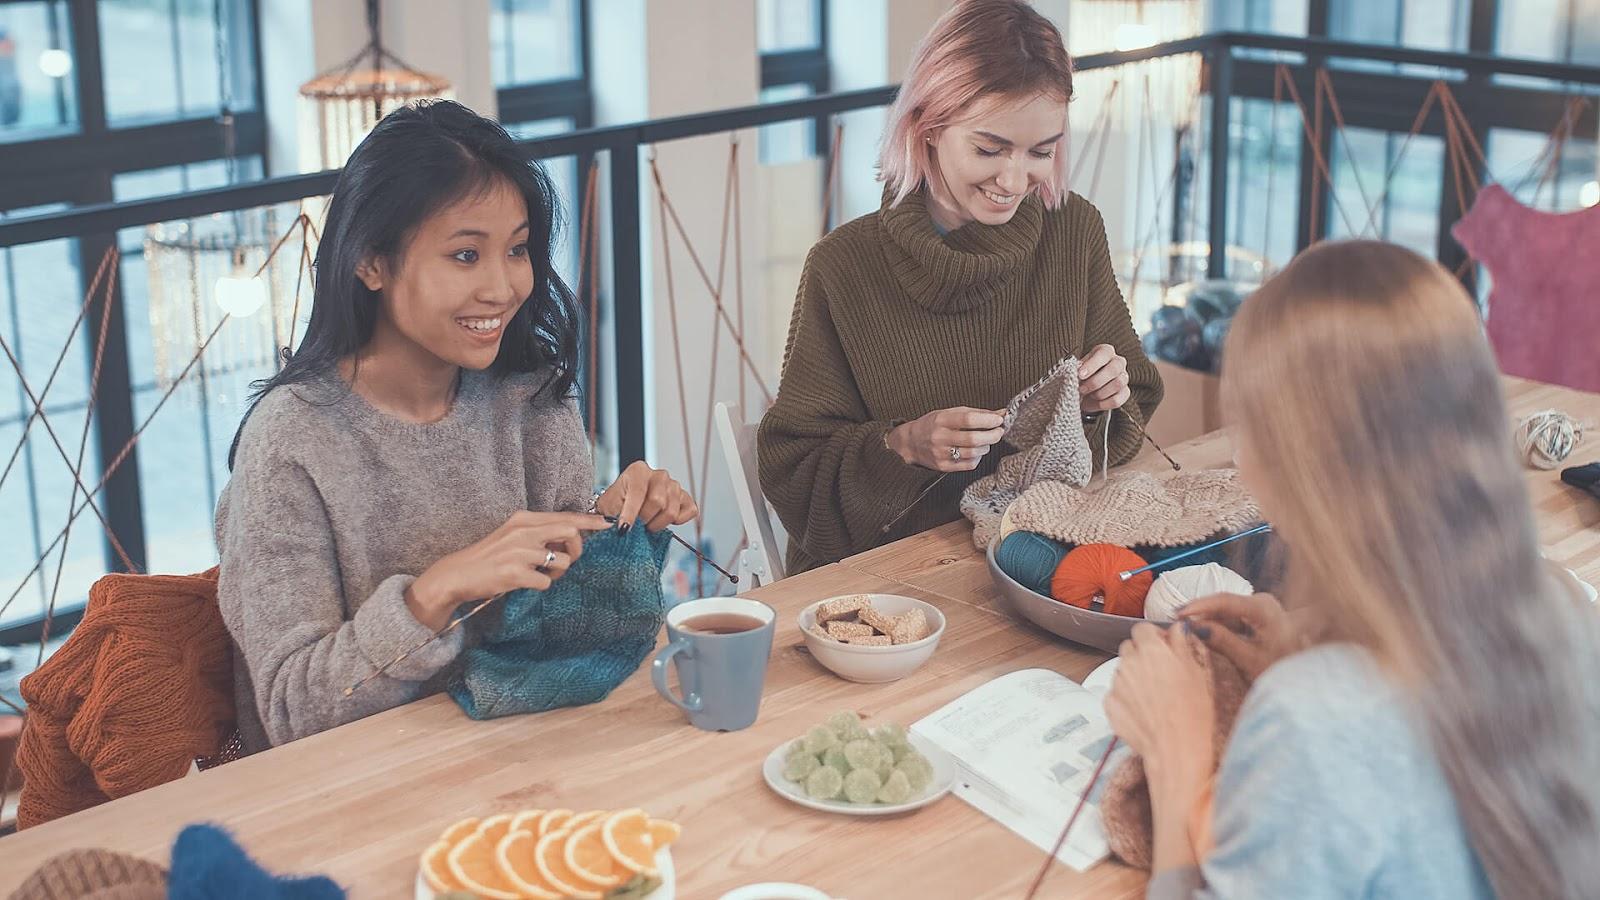 Group of girls knitting